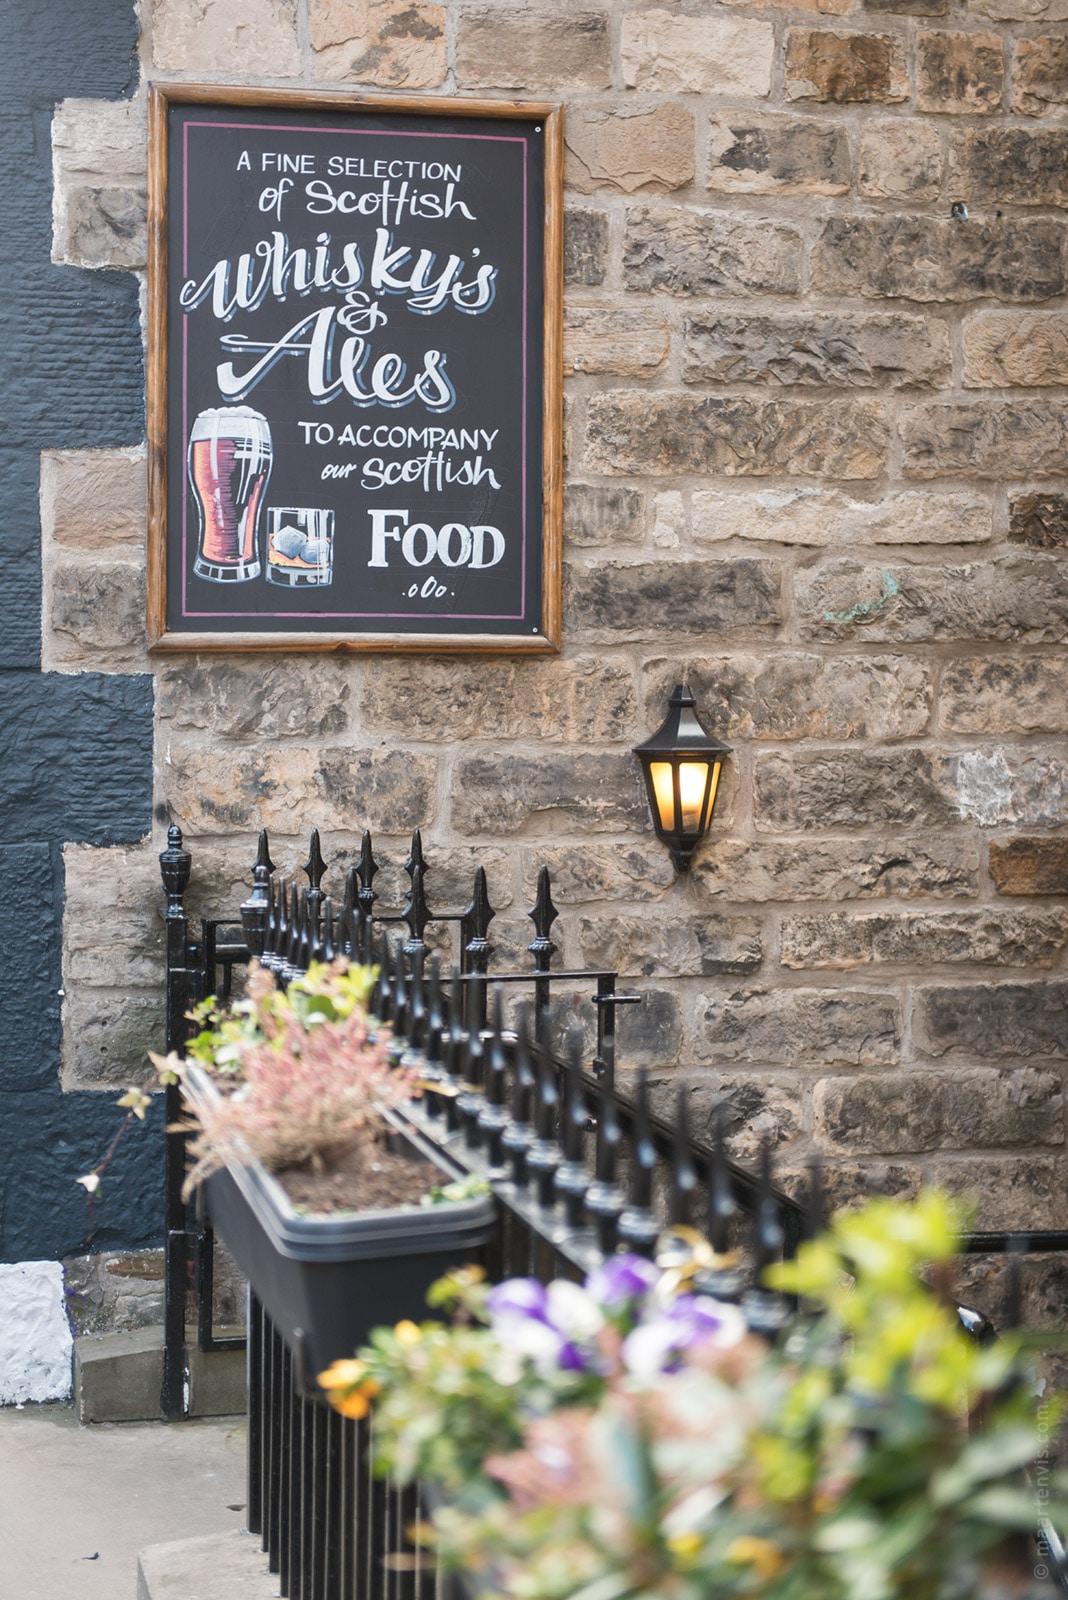 20150523 8766 - Enjoying Edinburgh